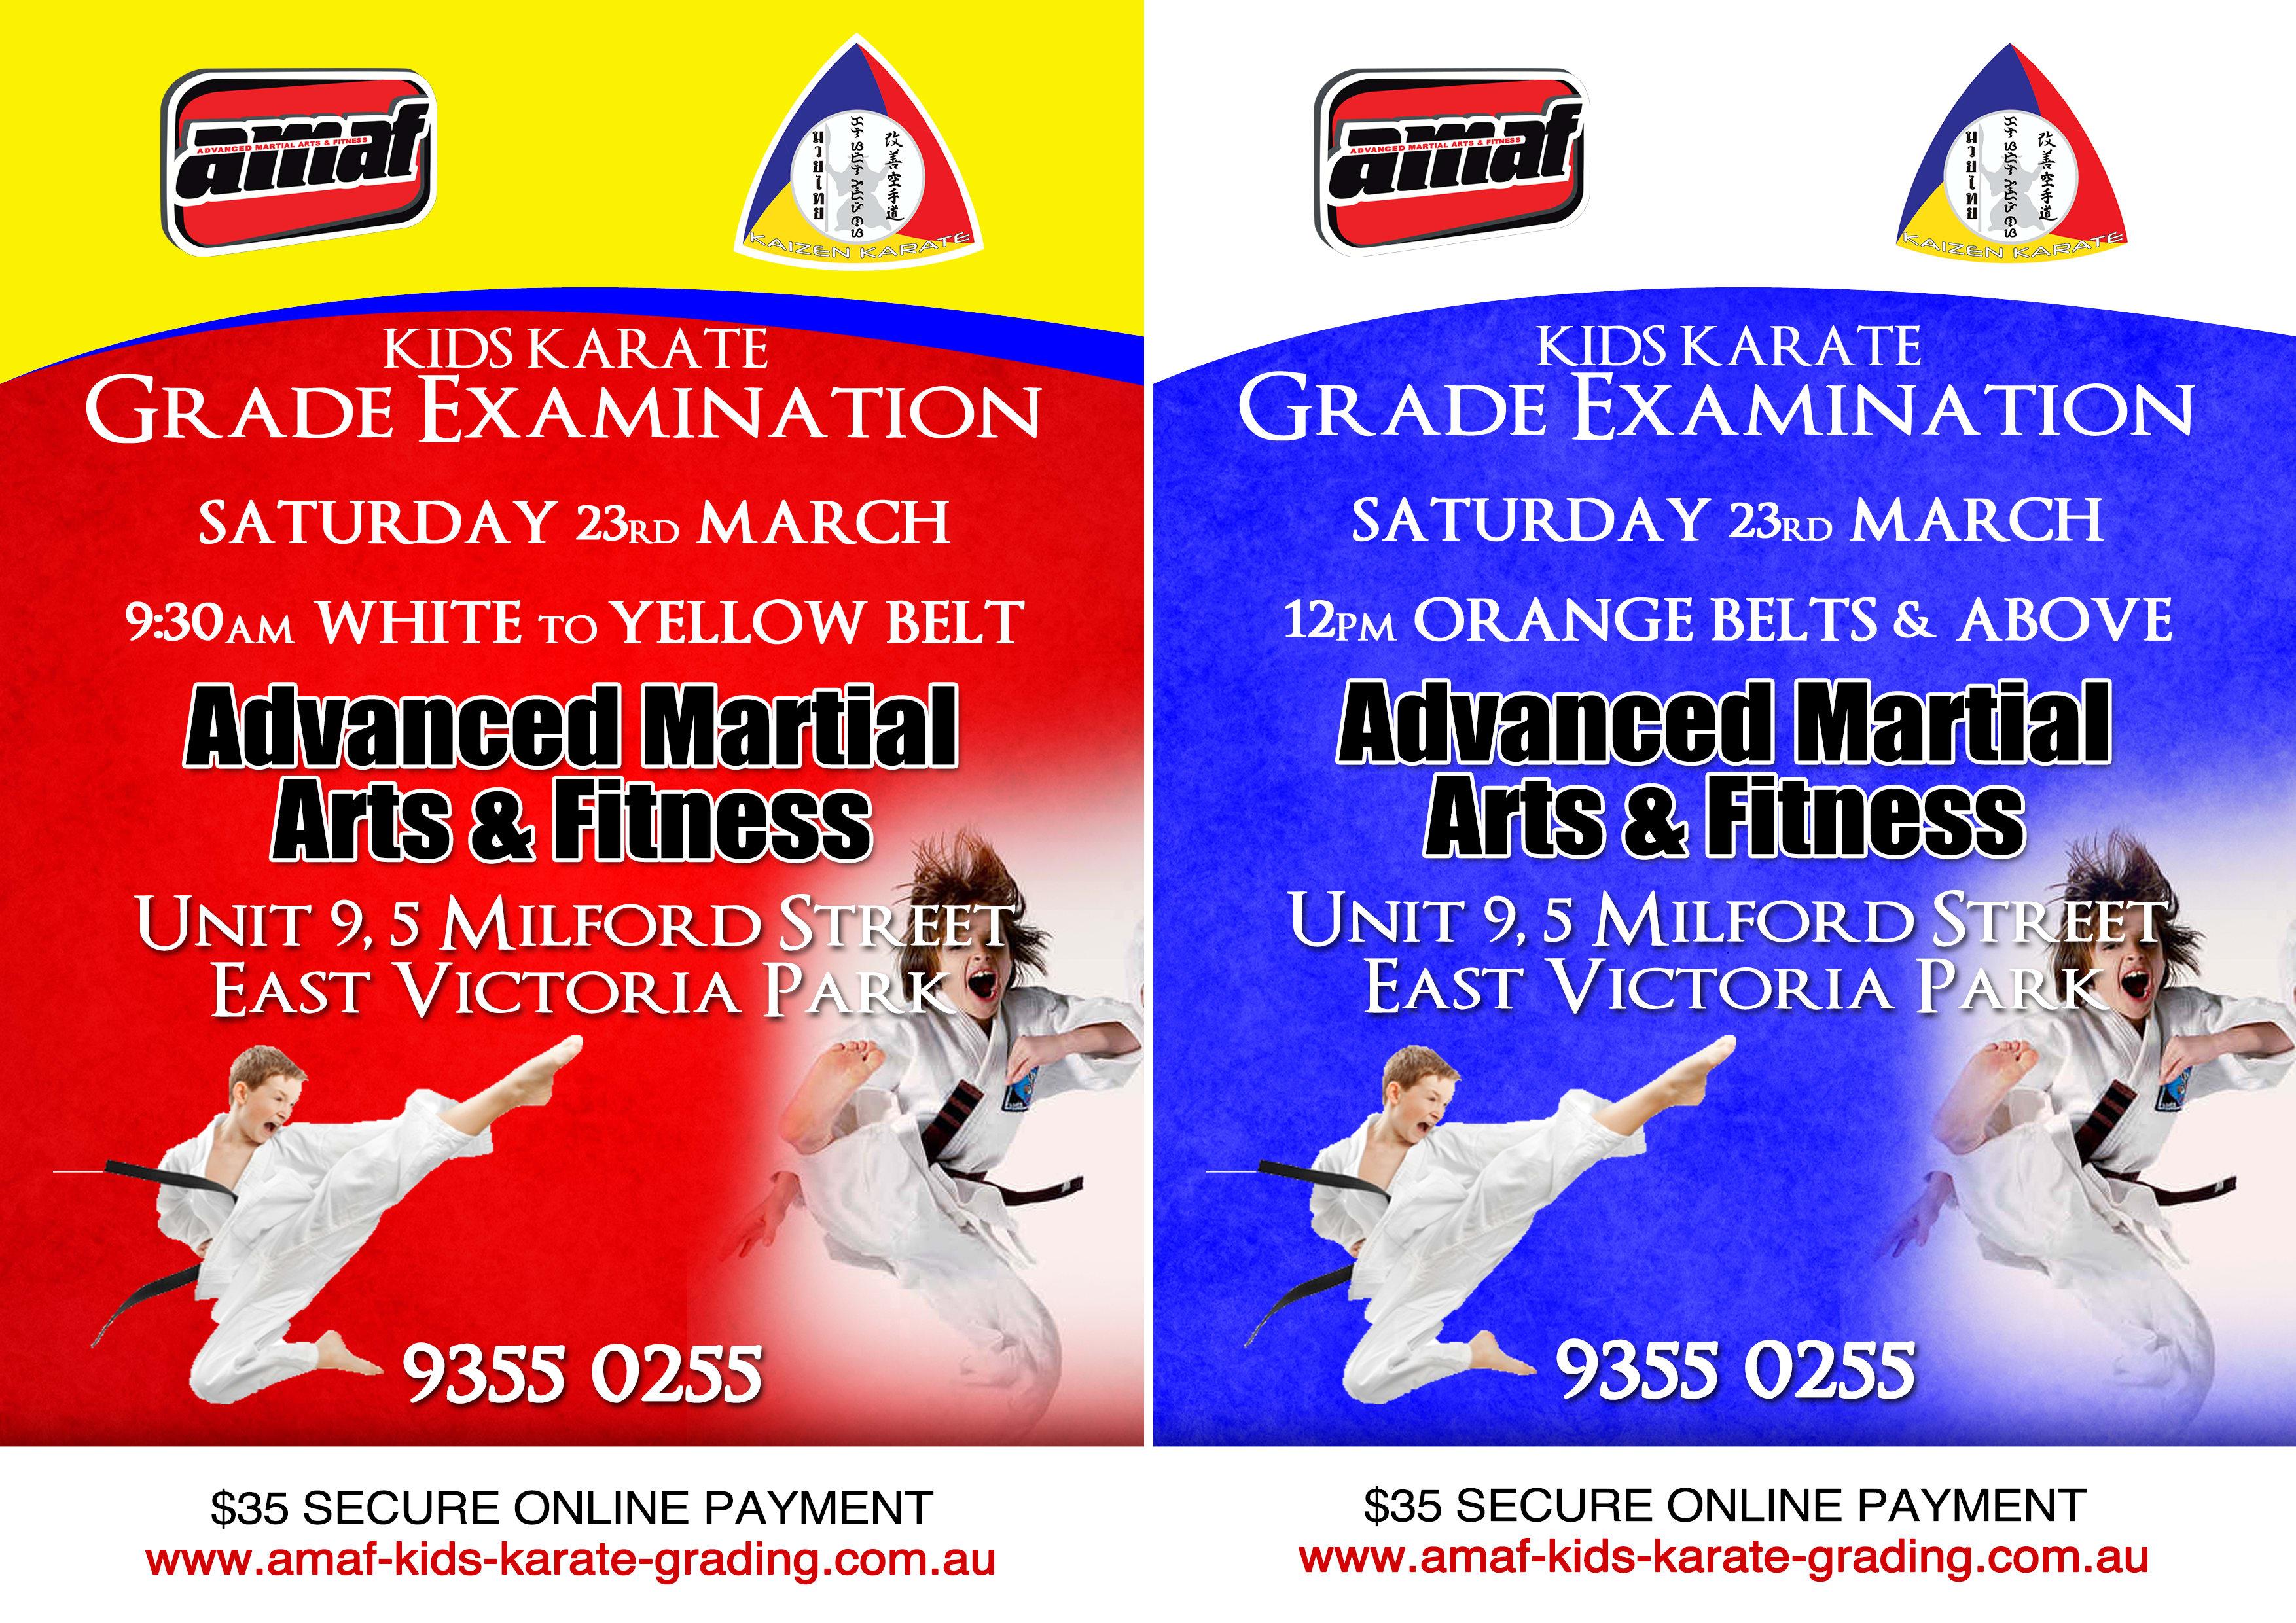 KIDS KARATE GRADE EXAMINATION in East Victoria Park - Advanced Martial Arts & Fitness